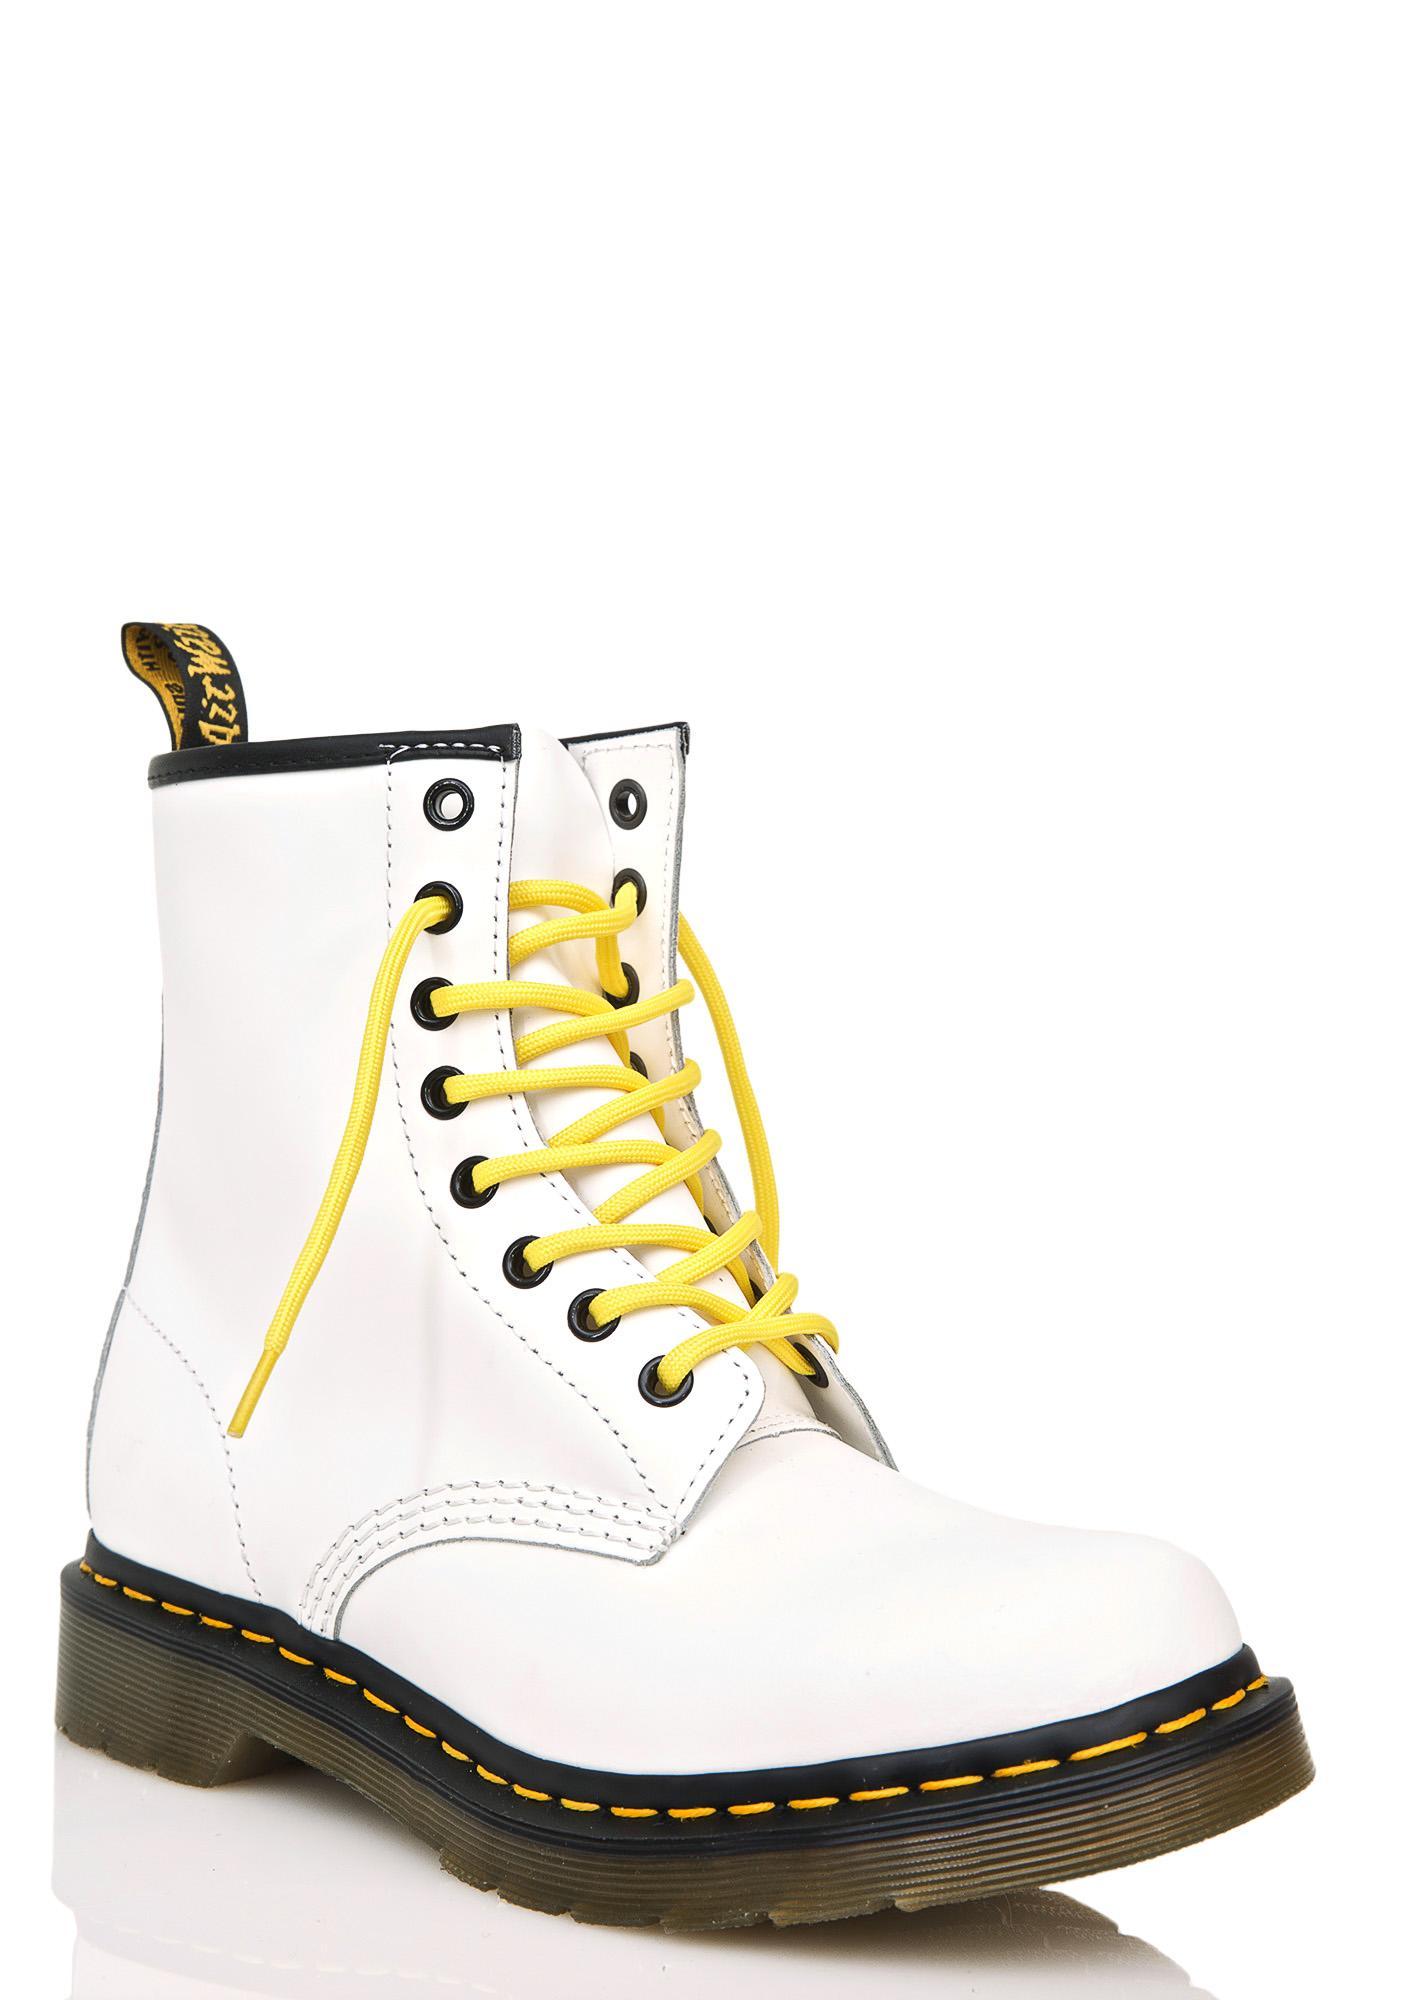 b647980e32b ... Dr. Martens White 1460 8 Eye Boots ...